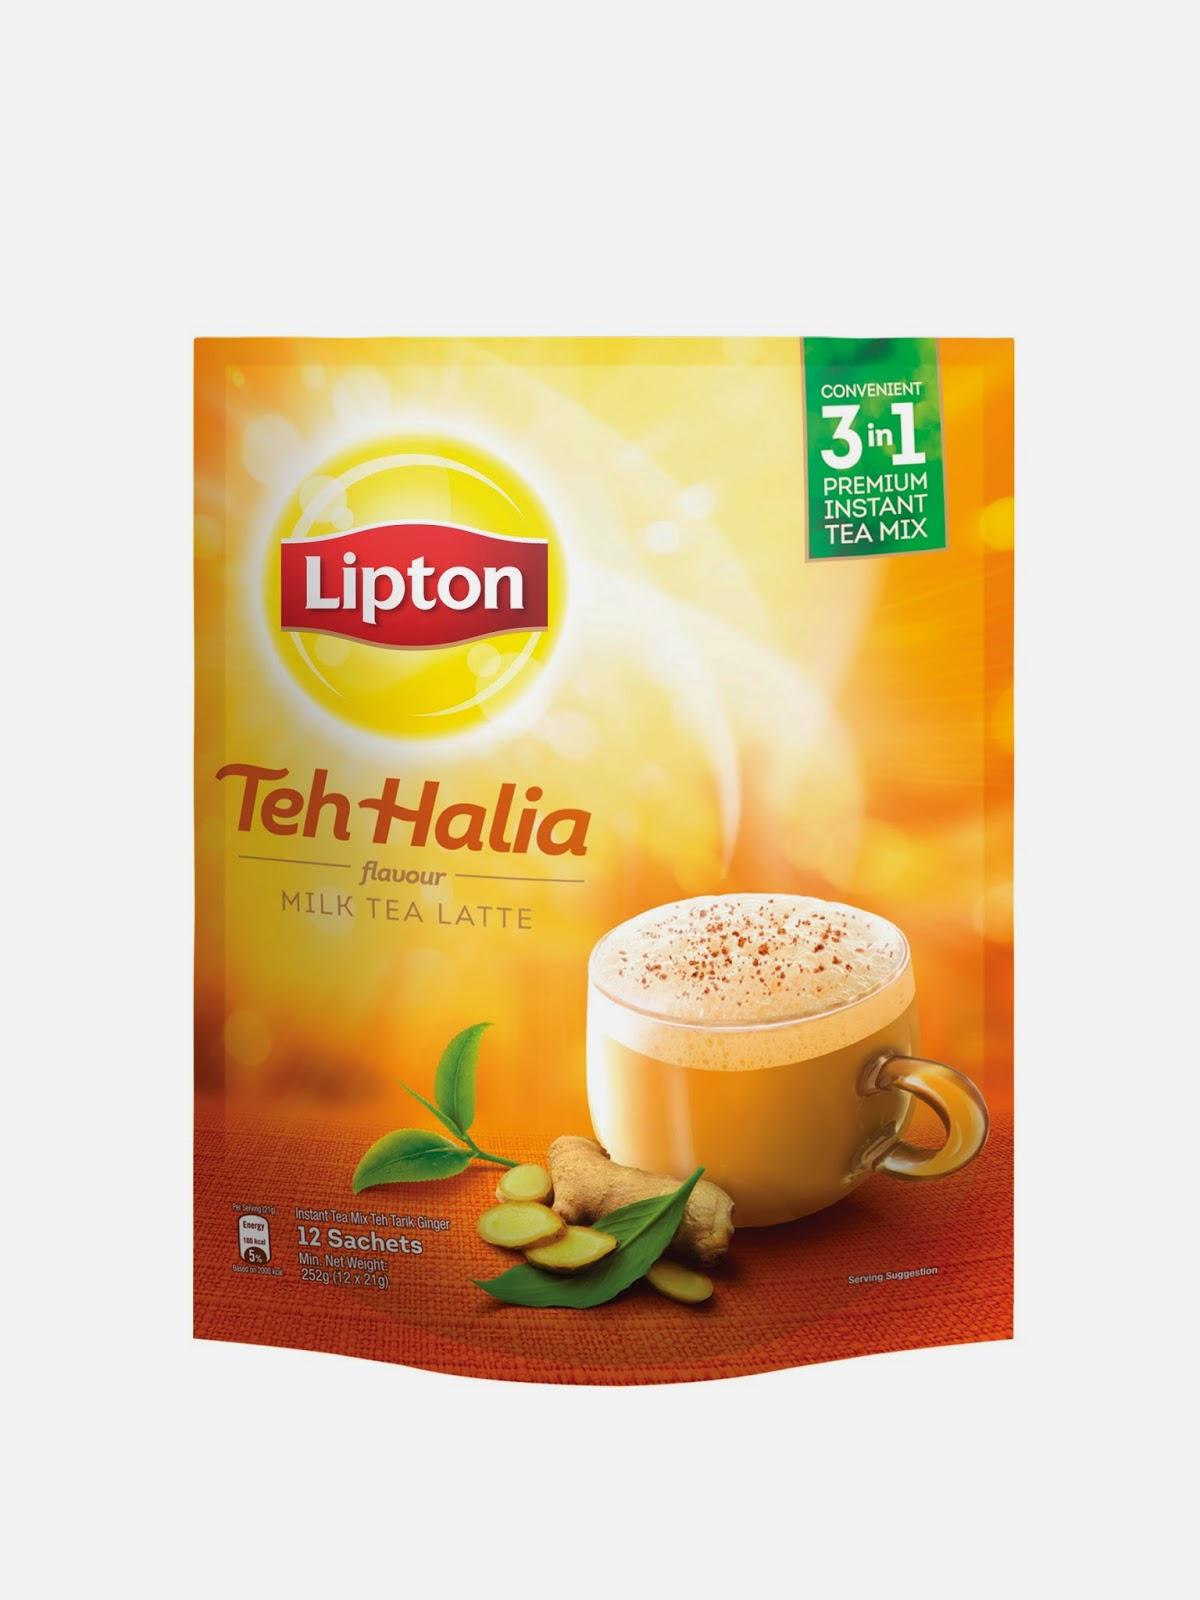 lipton iced tea powder instructions